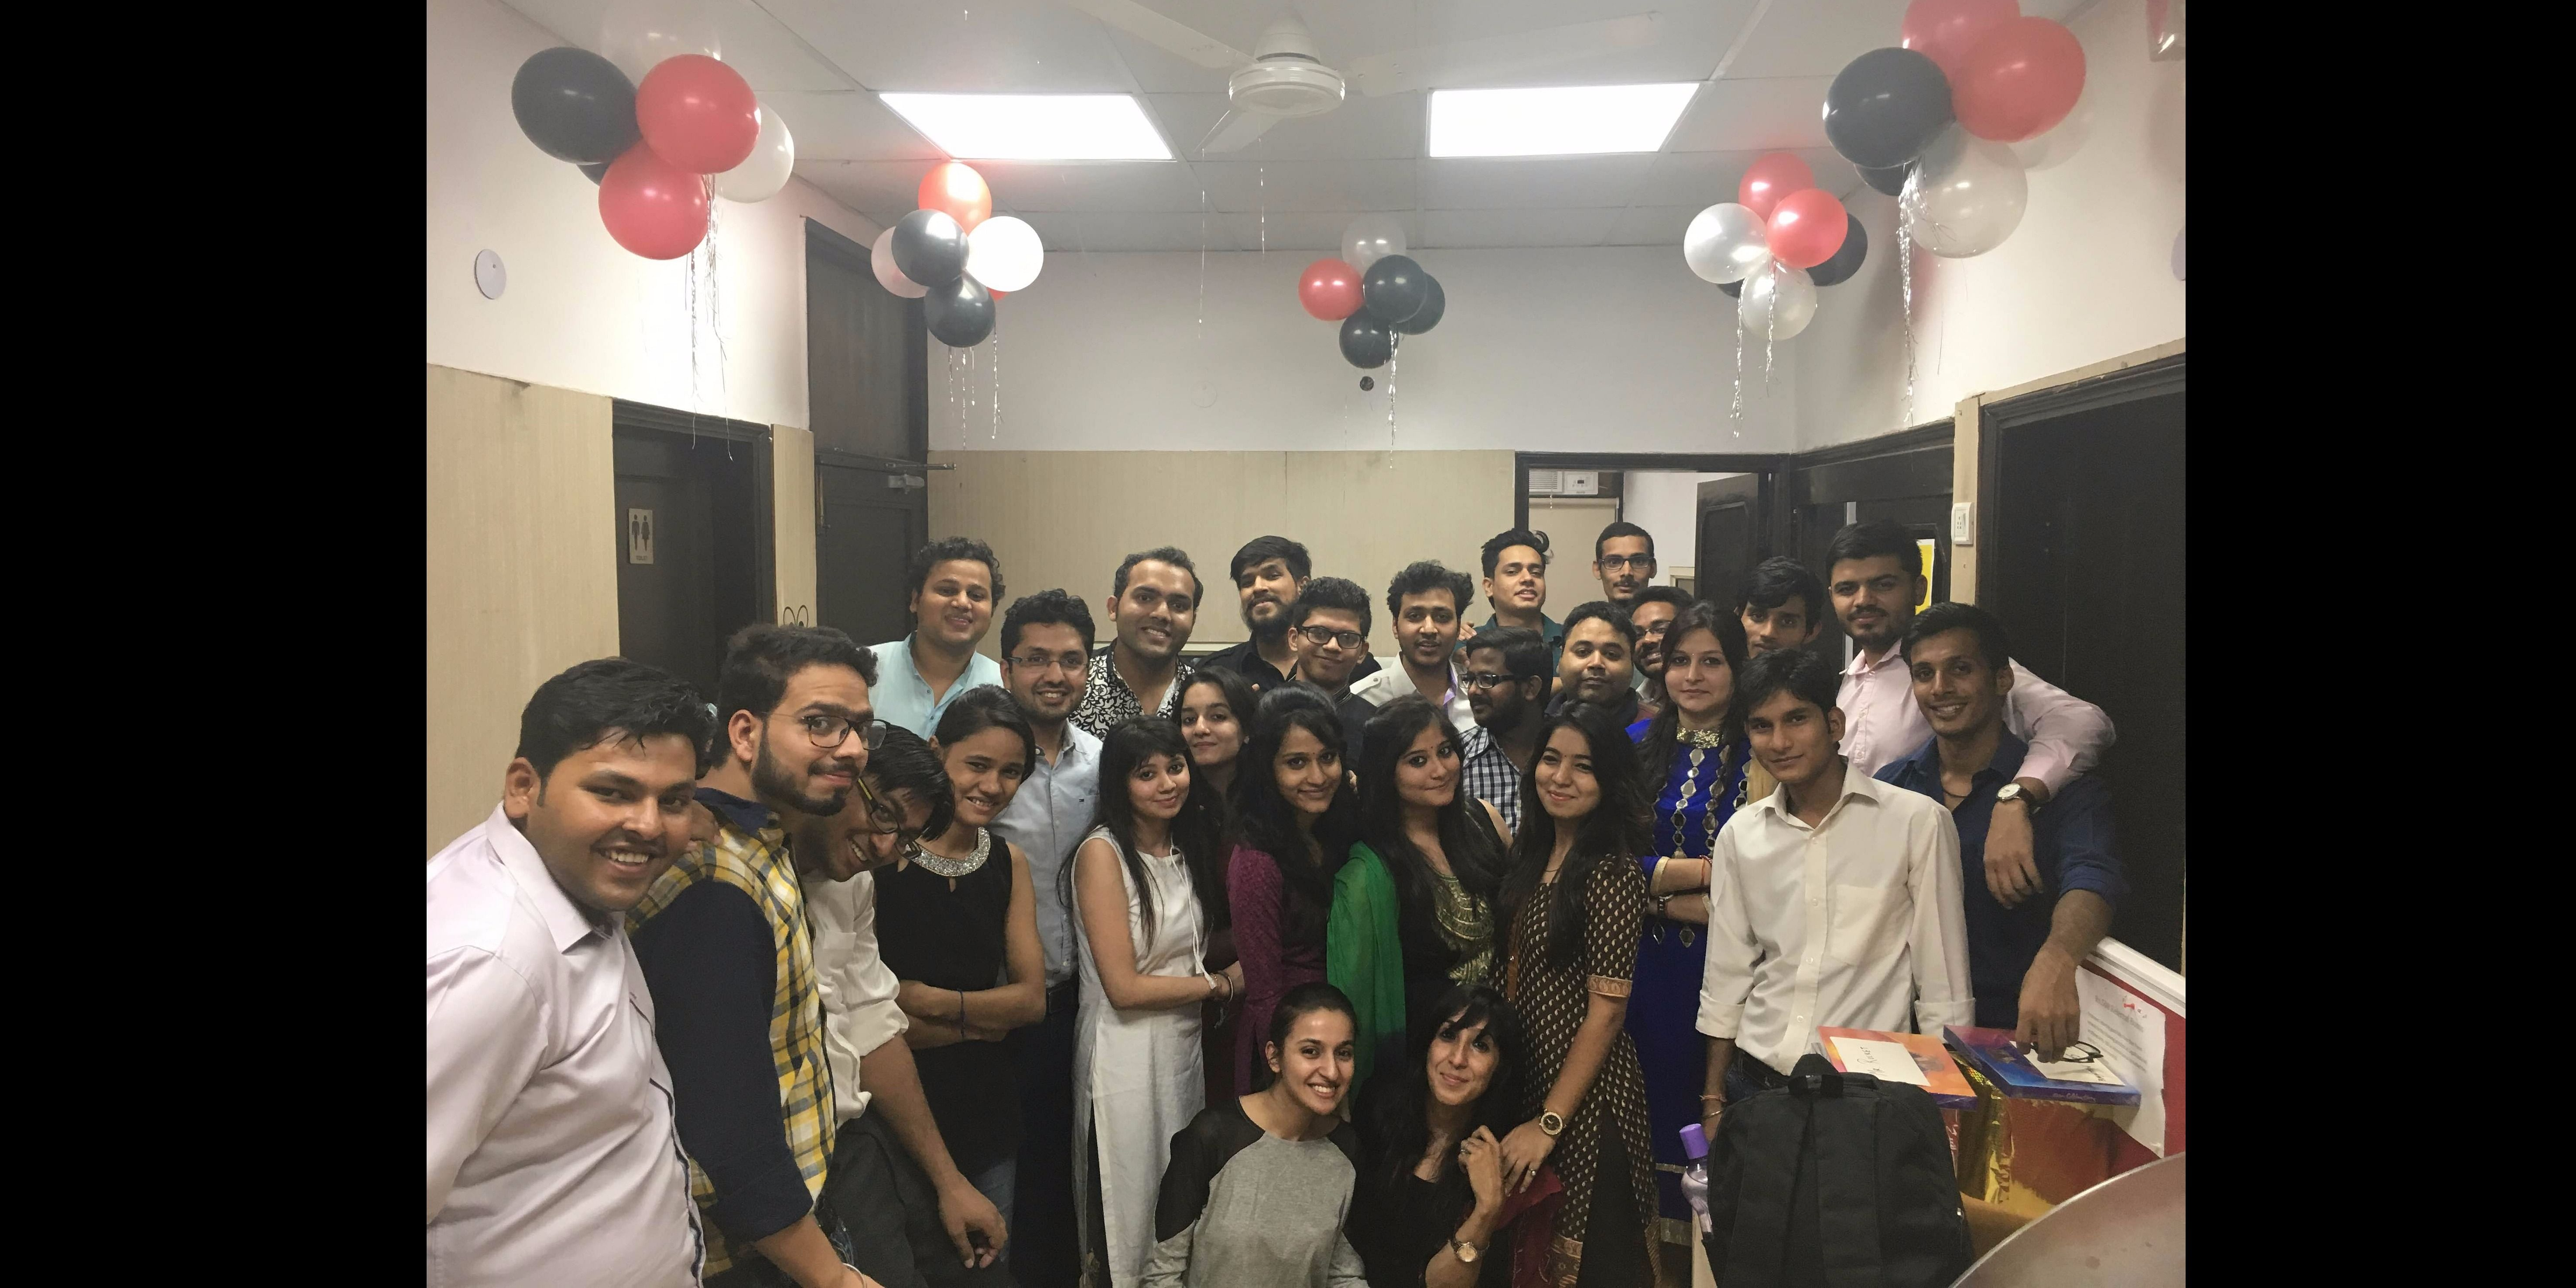 LegalRaasta Team celebrating Diwali